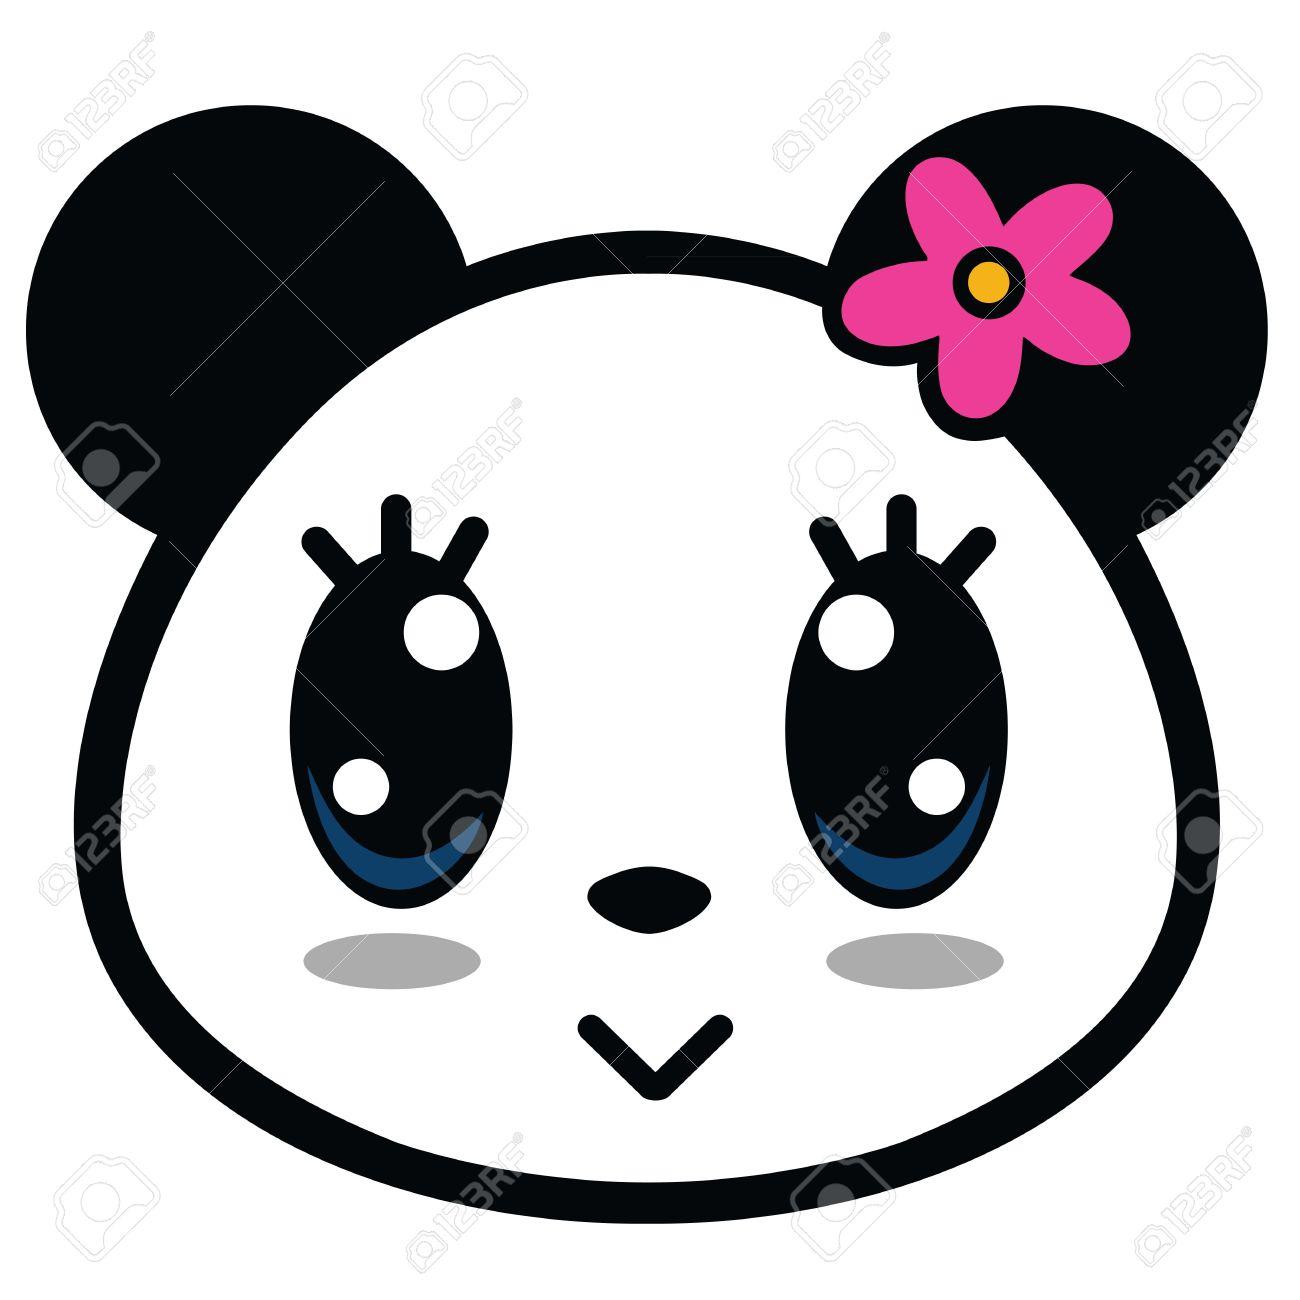 Cute Panda Girl With Big Eyes Cartoon Vector - 60744772